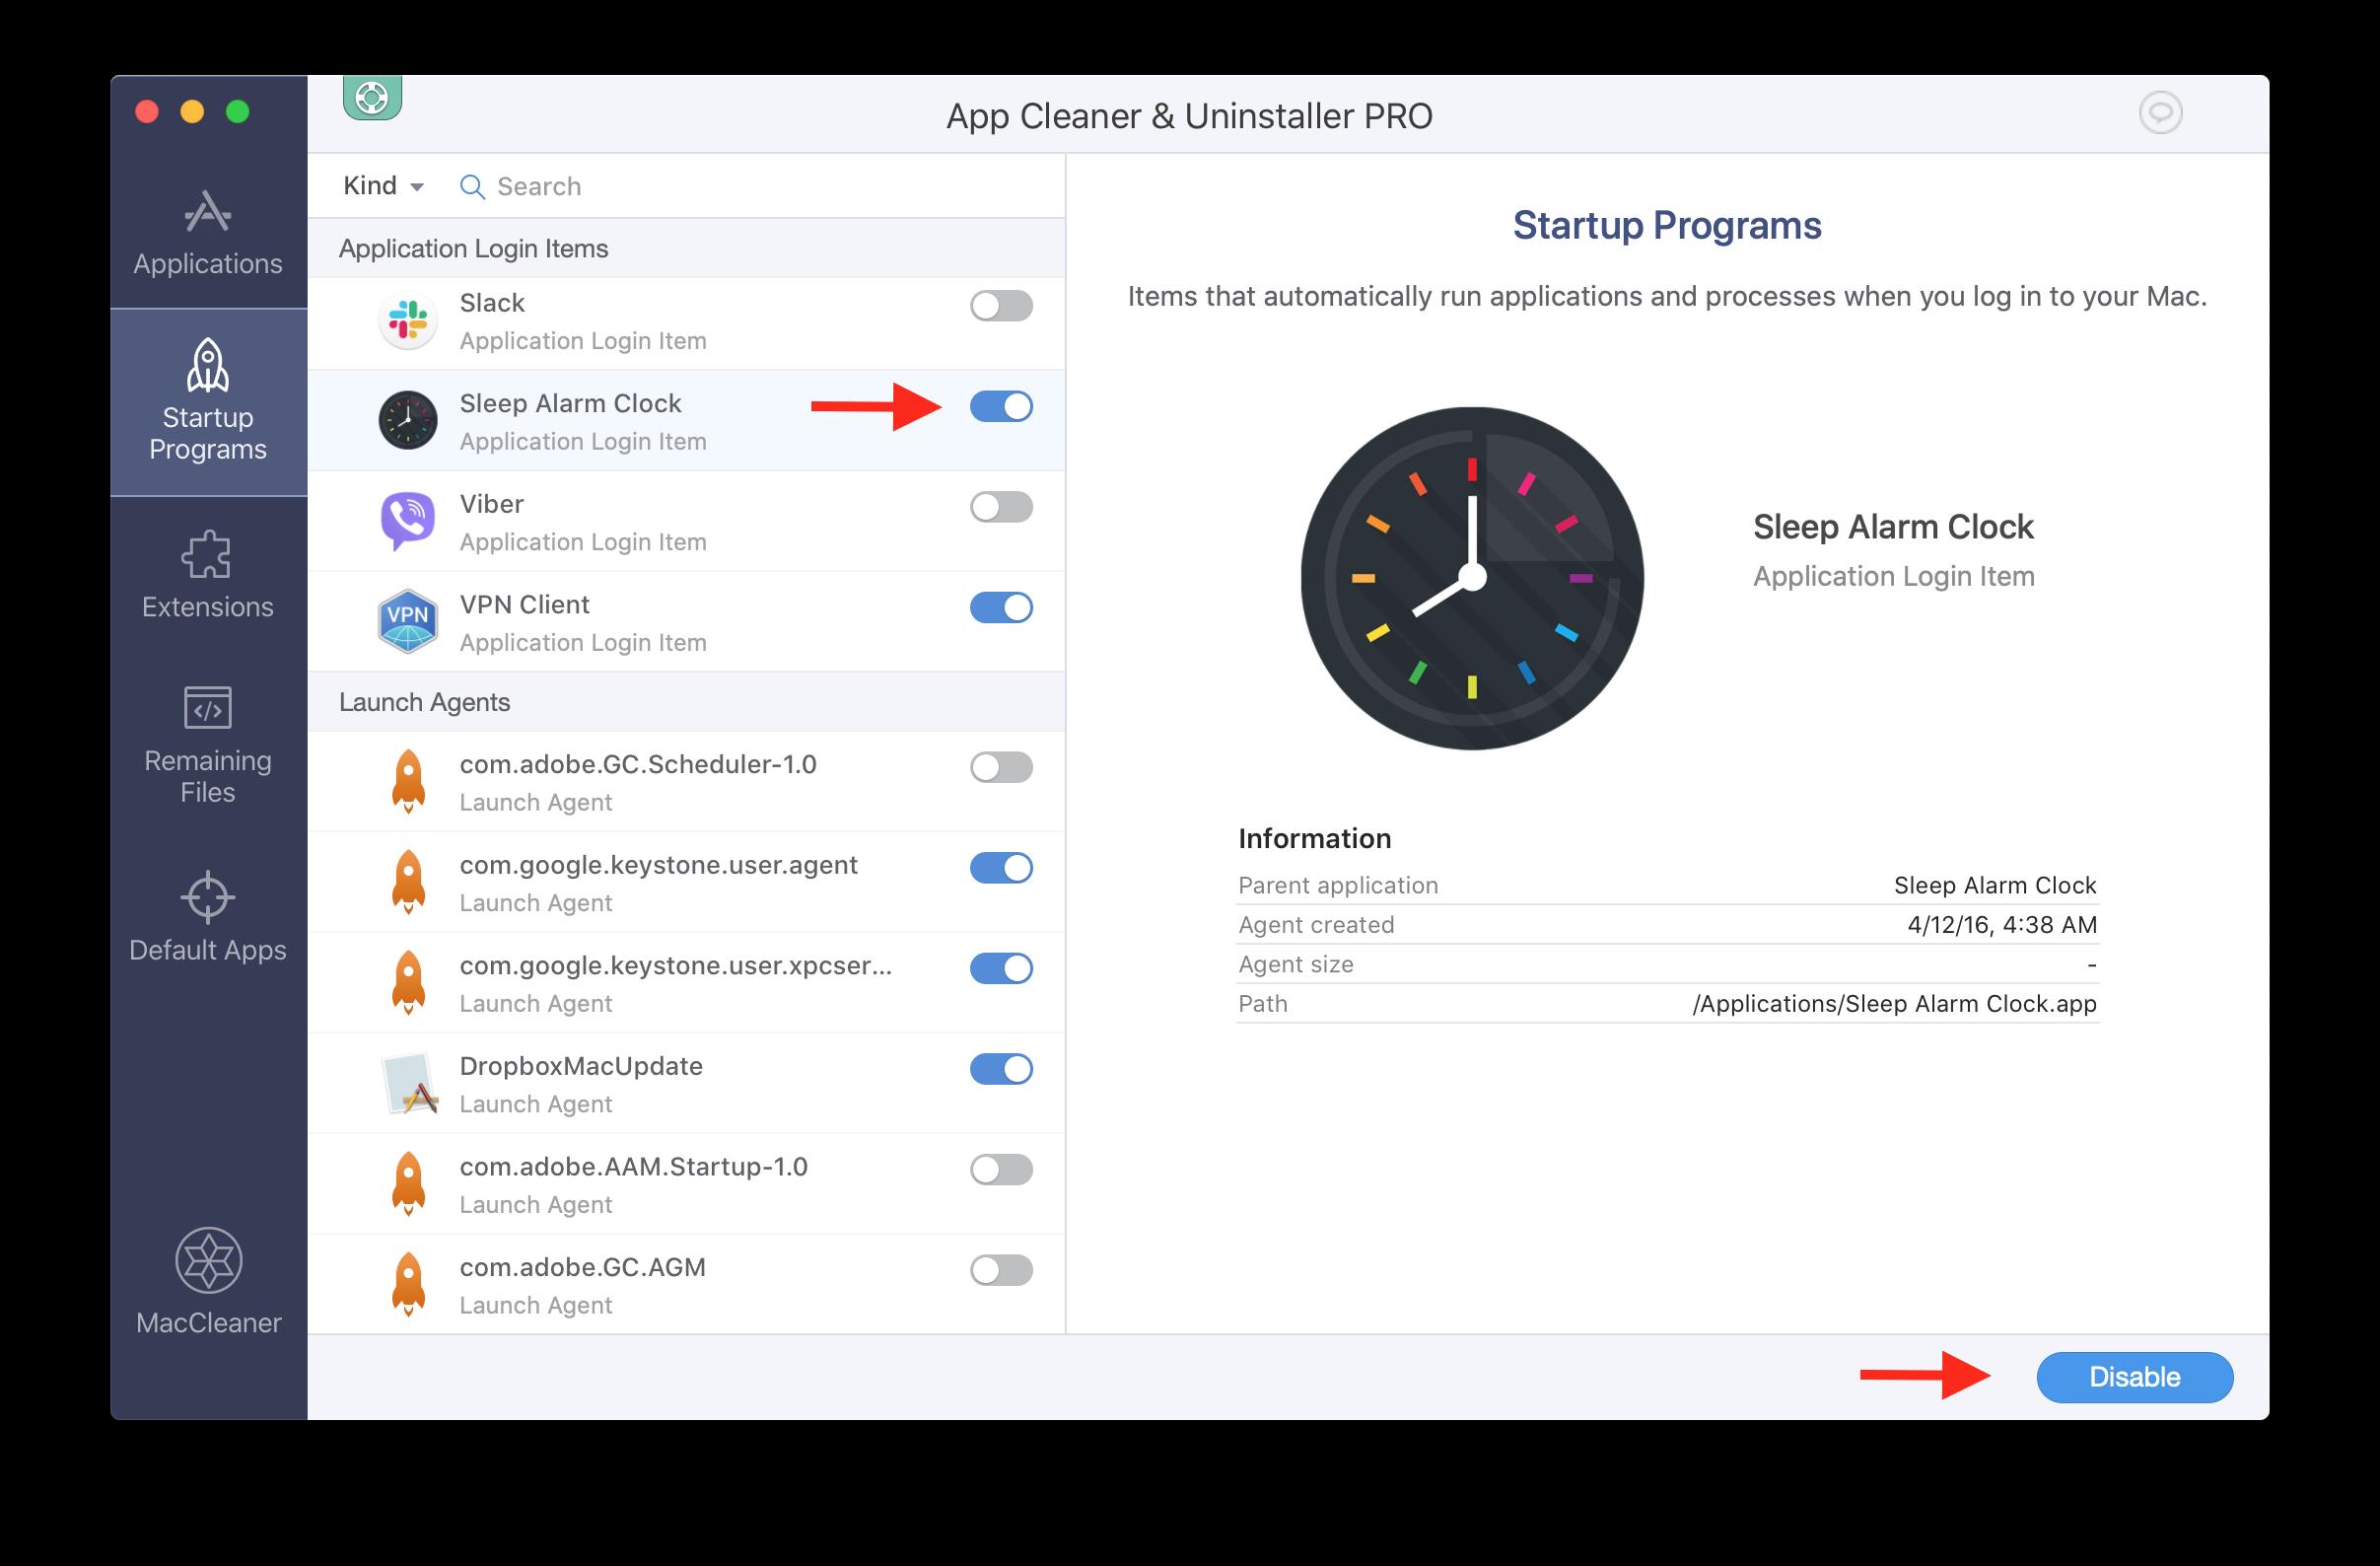 App Cleaner & Uninstaller window - startup programs tab